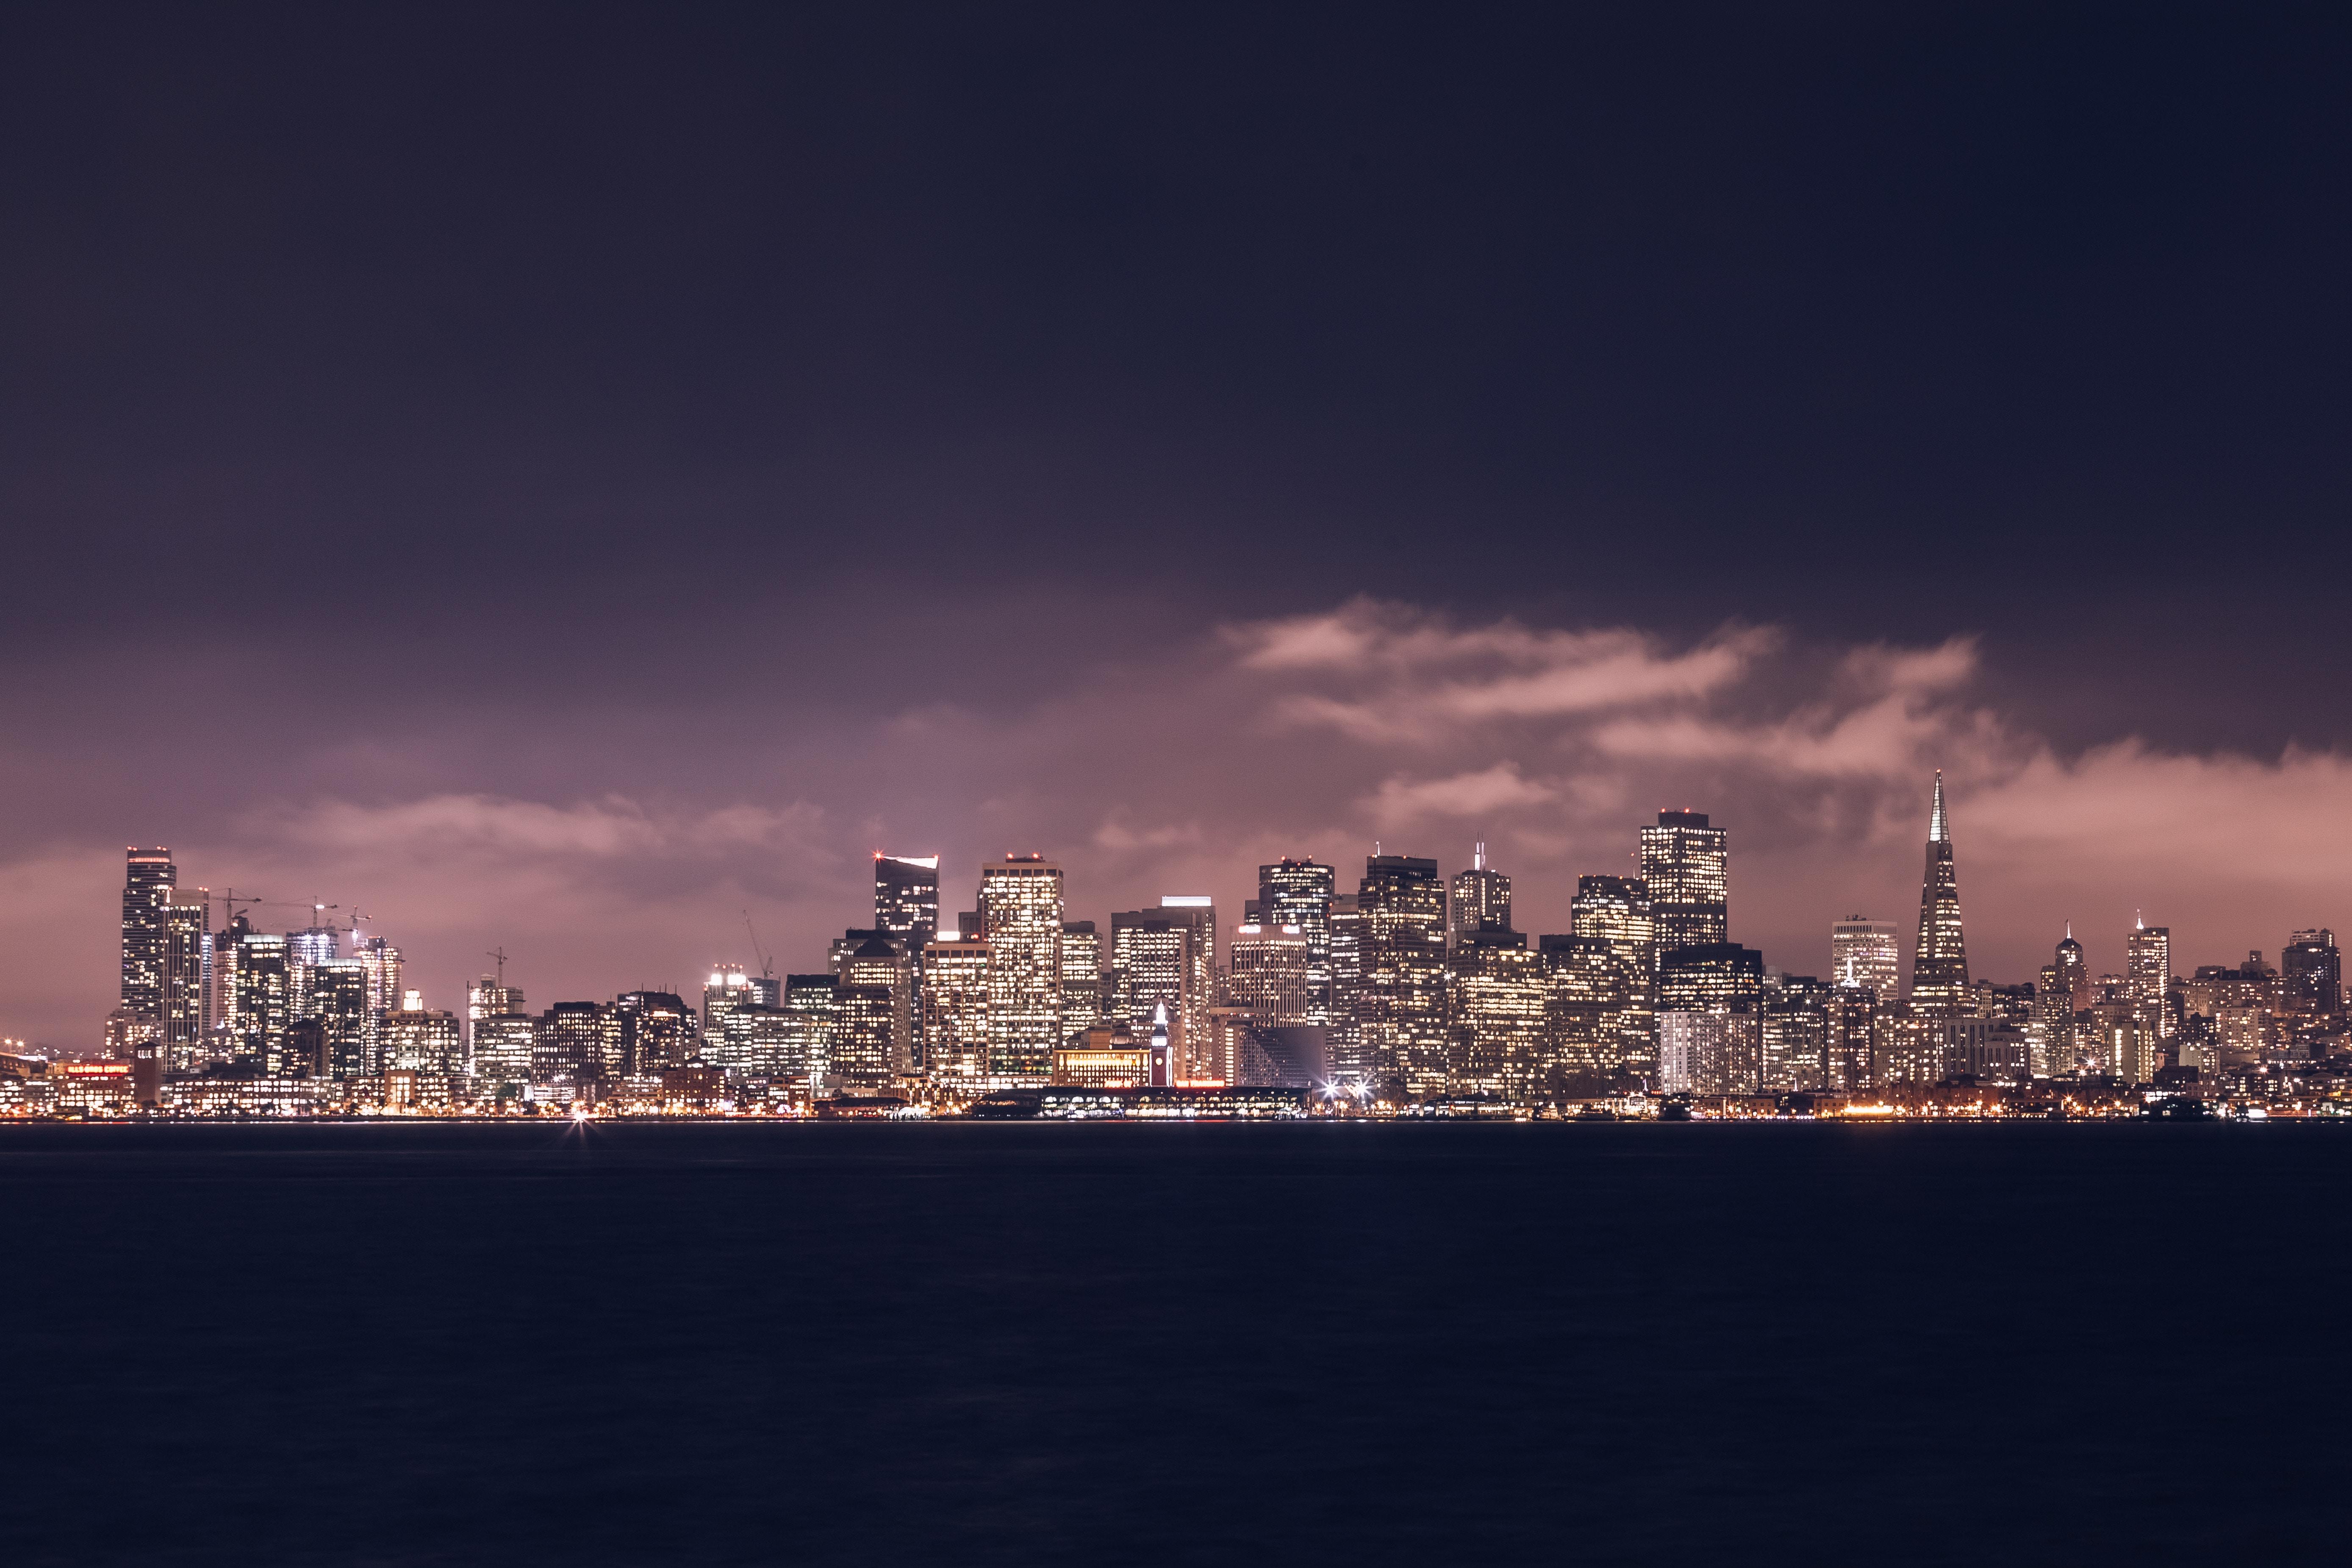 Building City Night San Francisco Skyscraper Usa 5552x3701